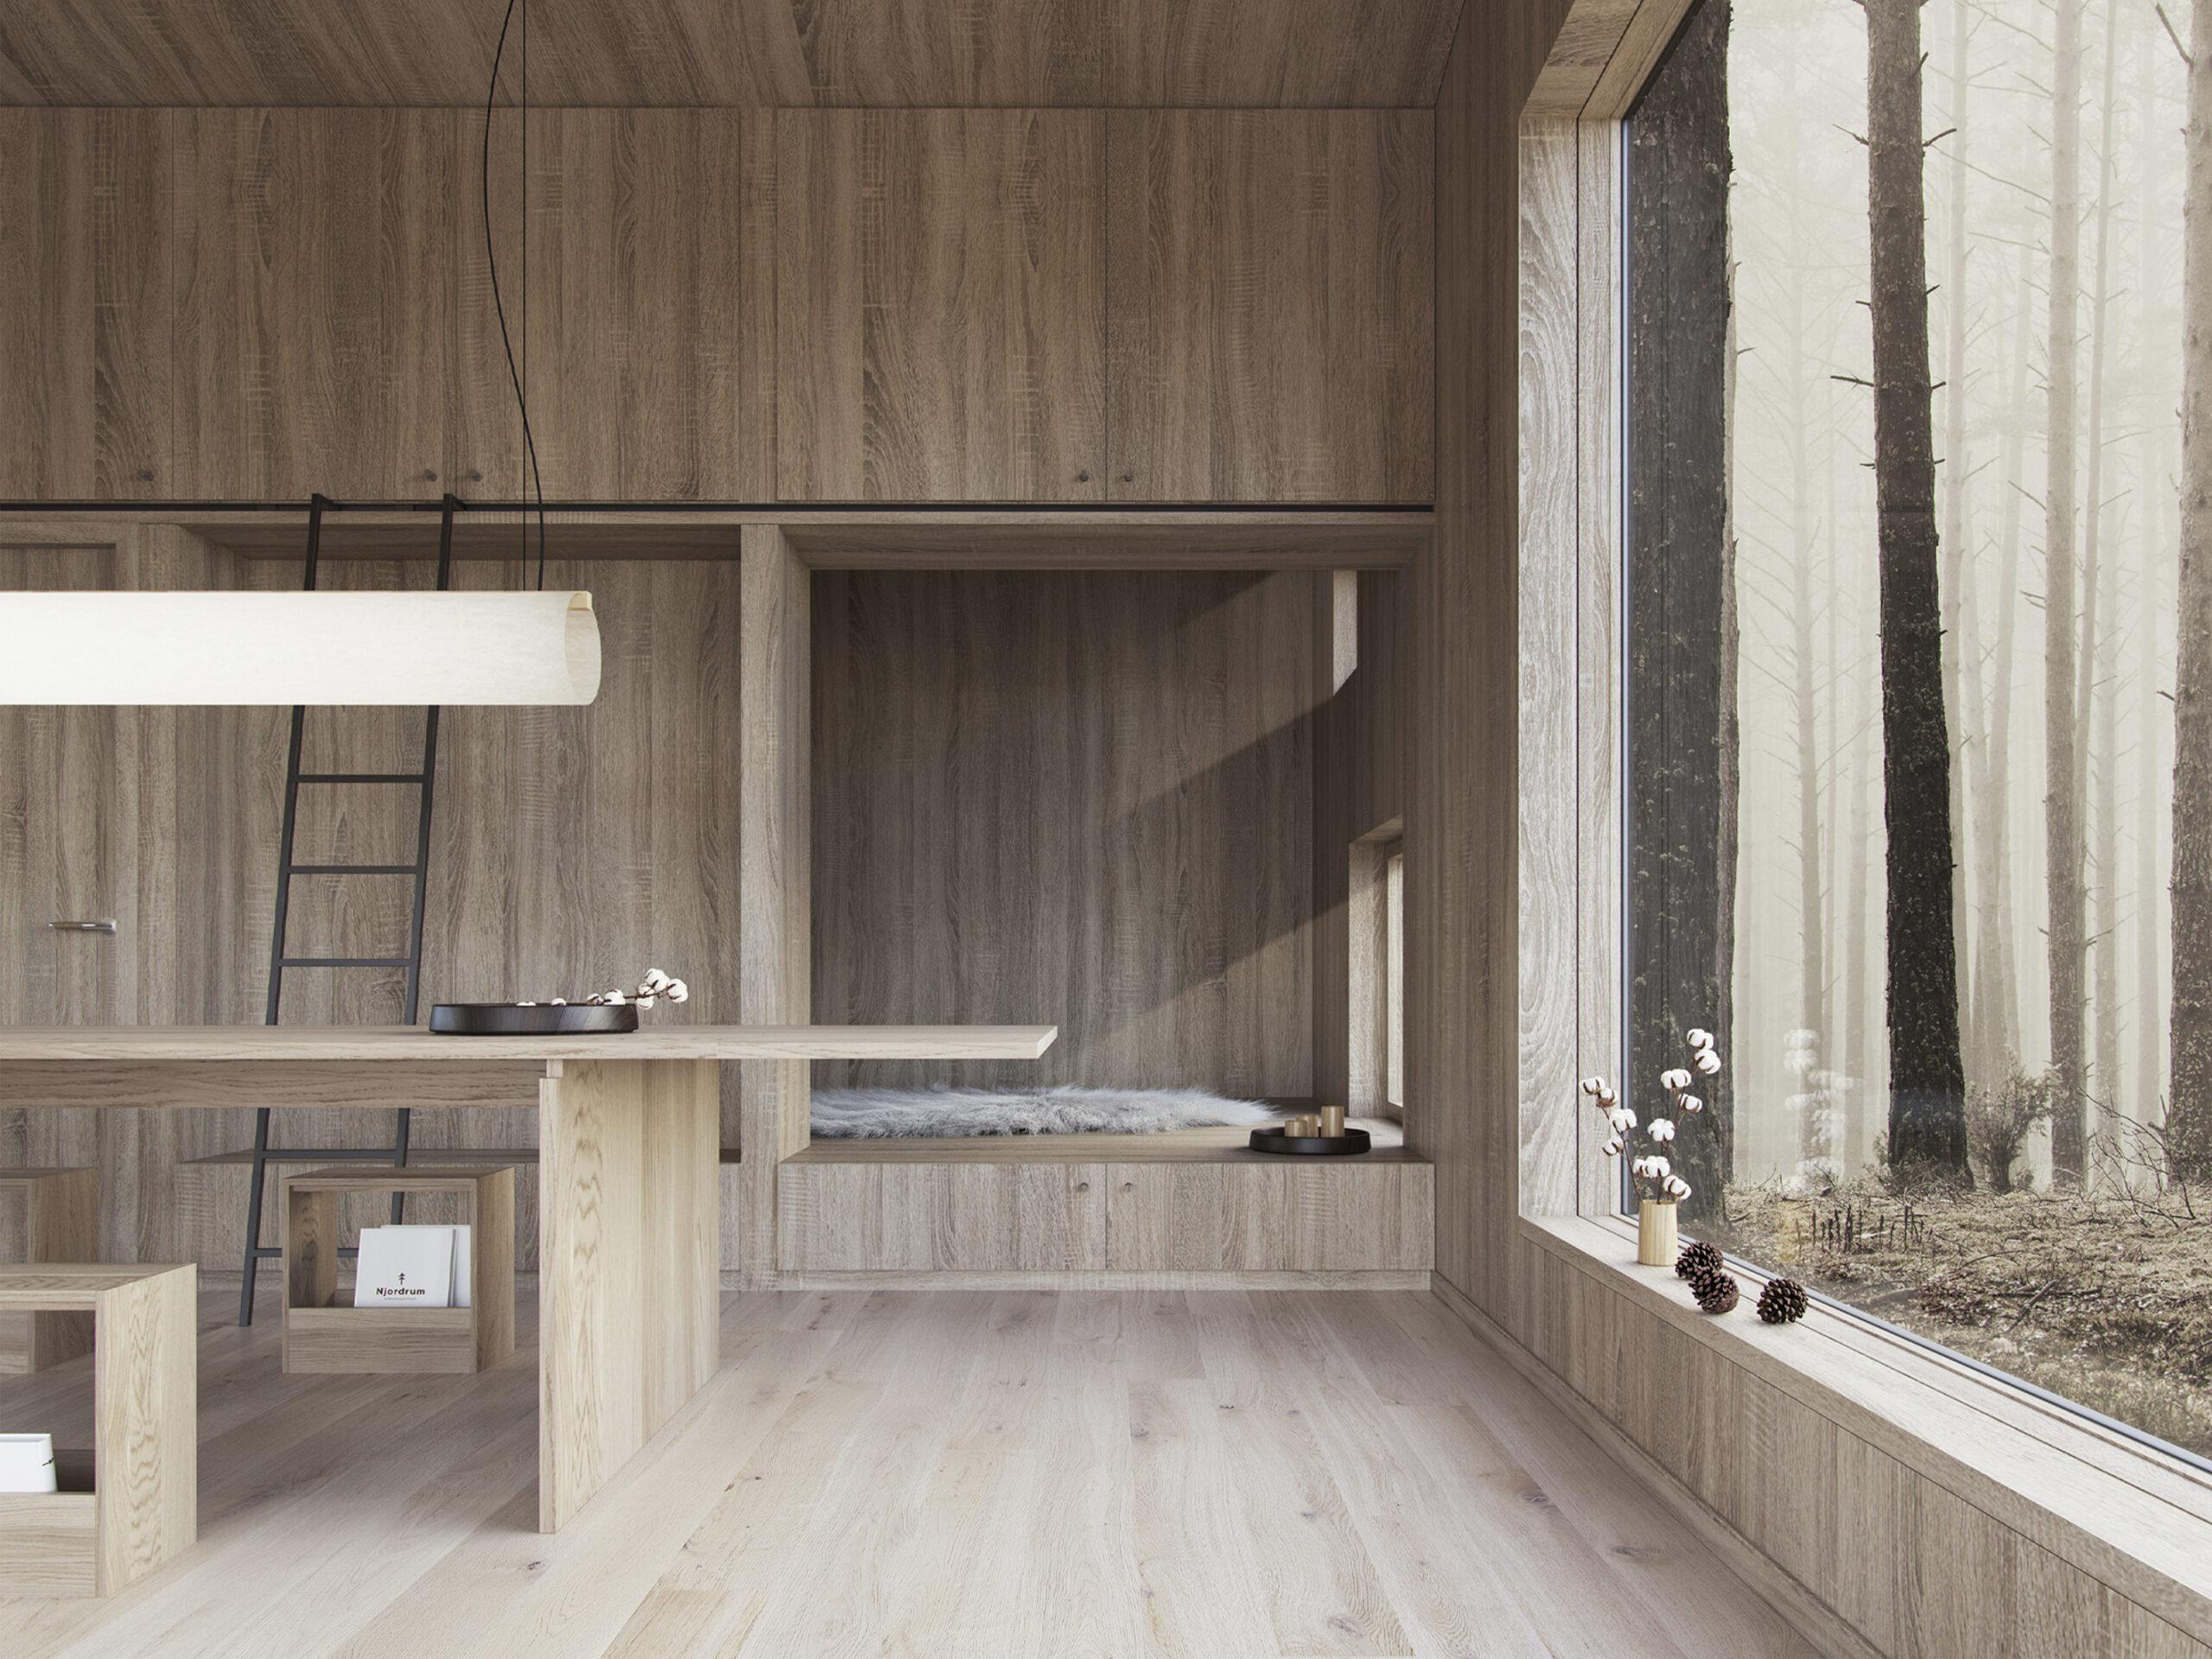 Njordrum - modulære træhuse